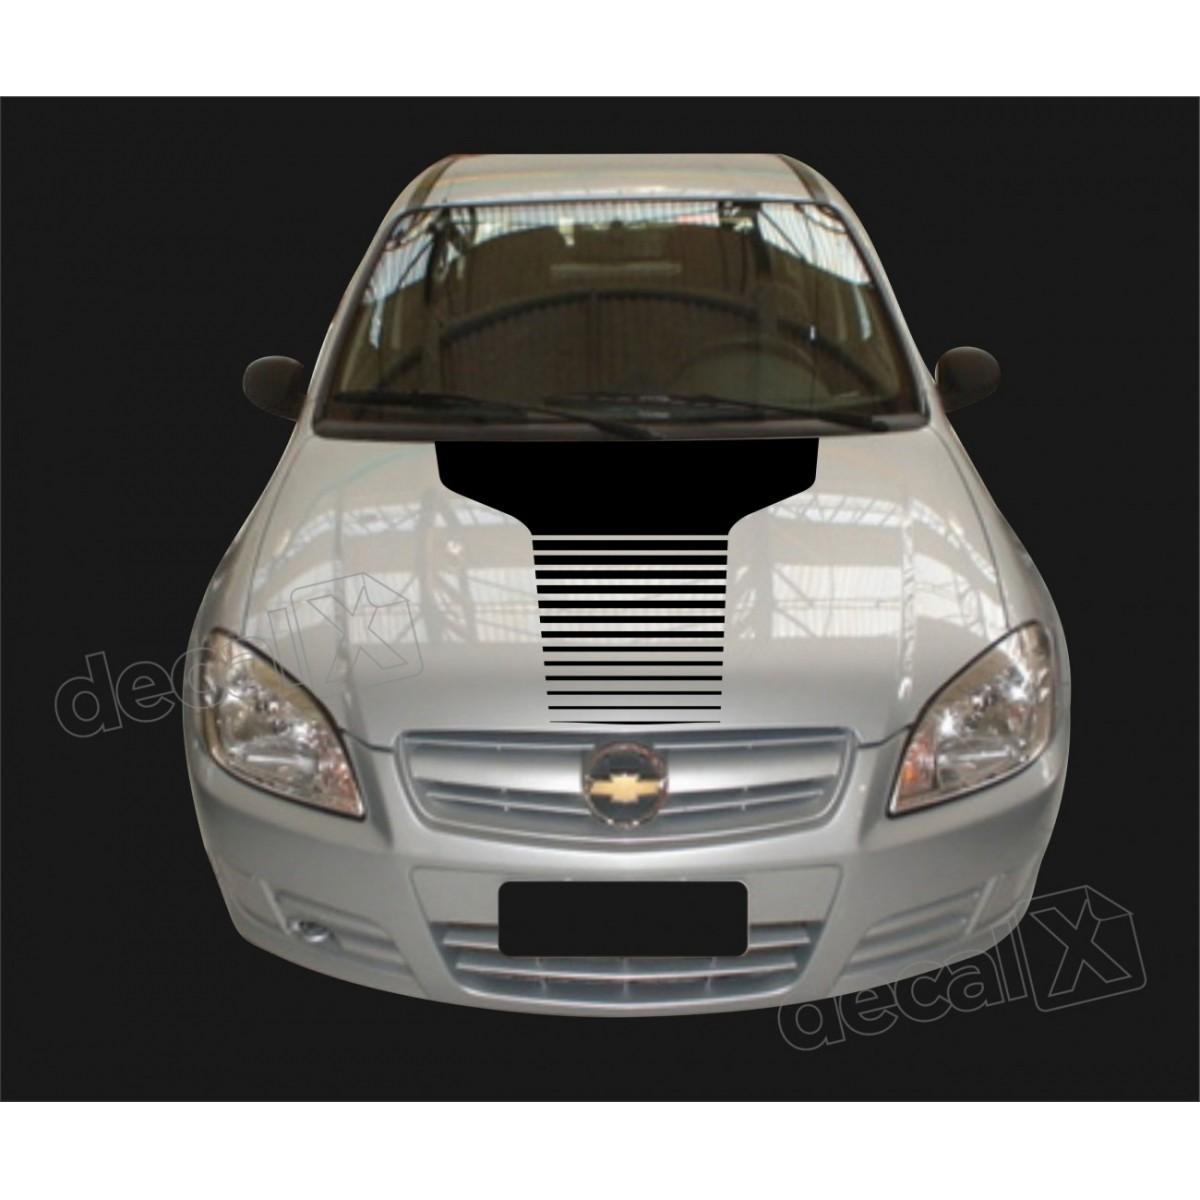 Adesivo Chevrolet Celta Faixa Capo 3m Ctm503